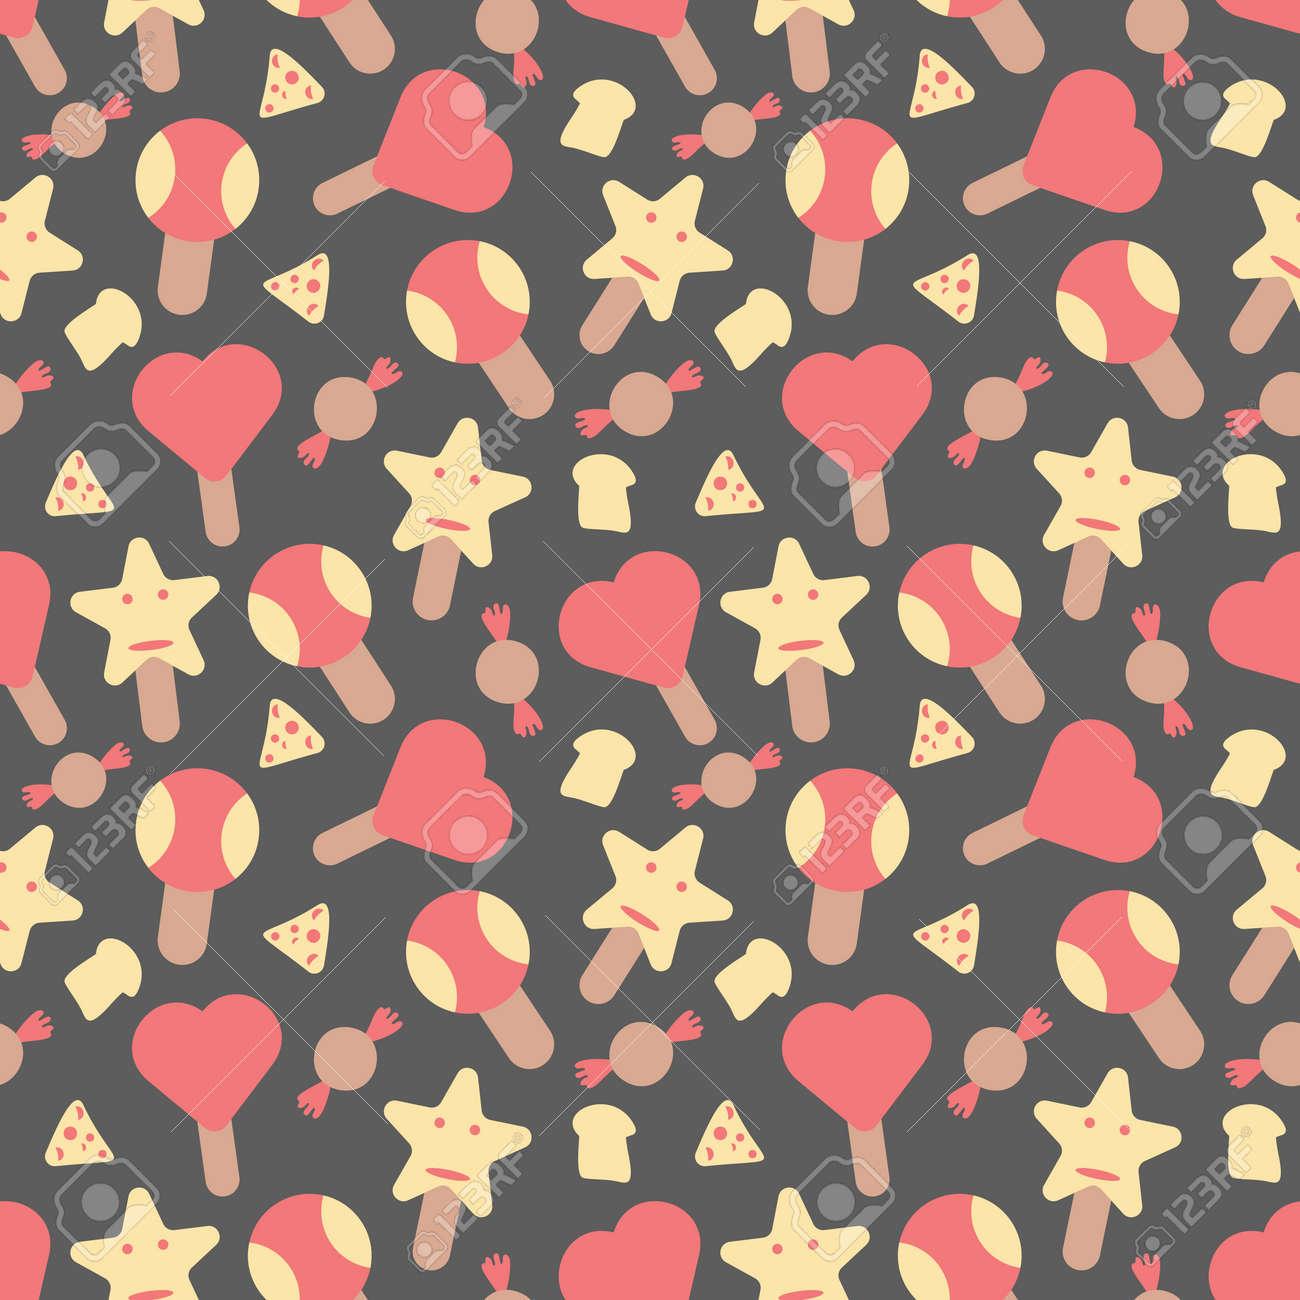 Ice cream elements seamless pattern background - 168741454